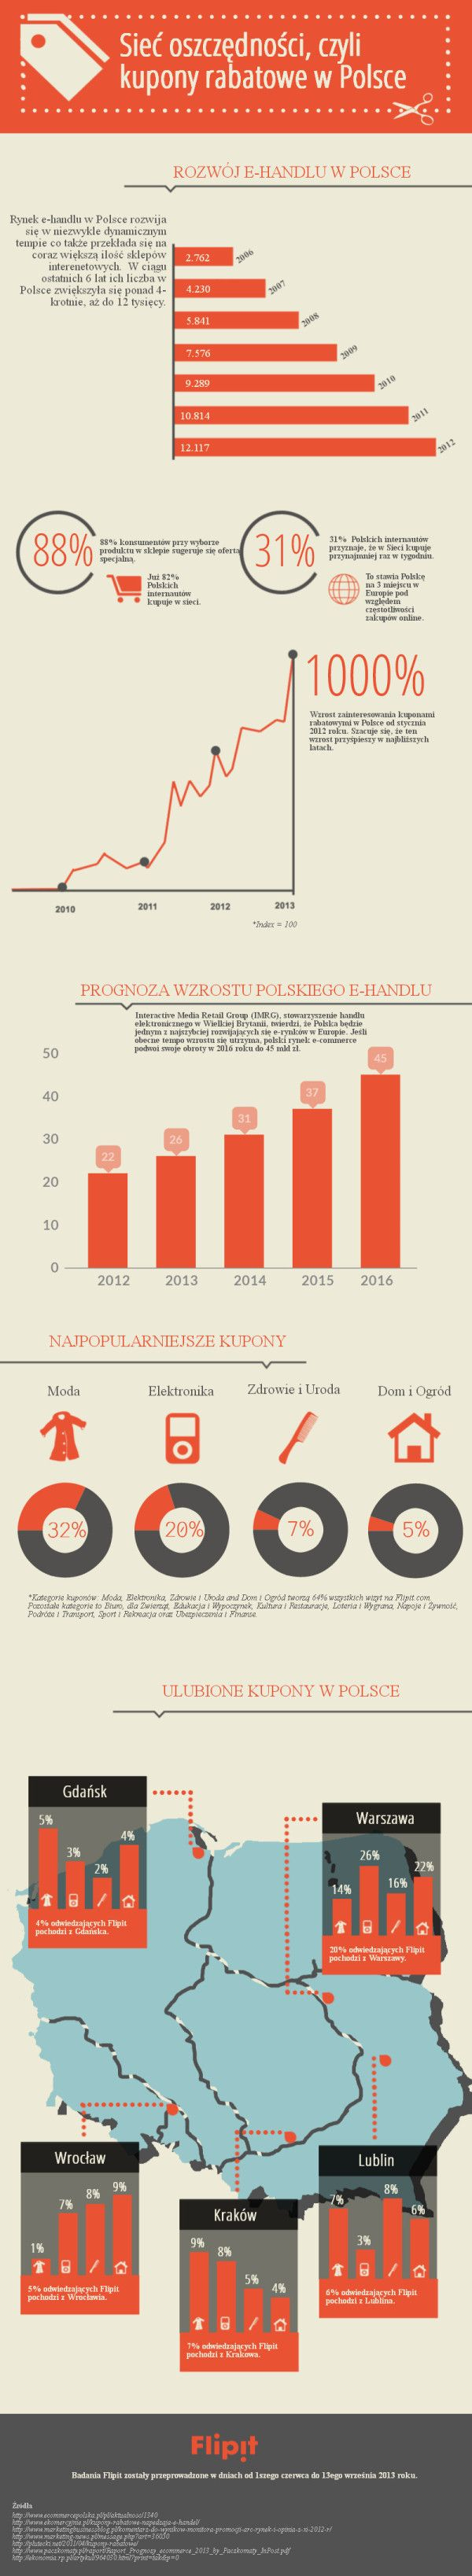 Kupony rabatowe w Polsce - infografika - NowyMarketing - Where's the beef? / ecommerce, e-commerce